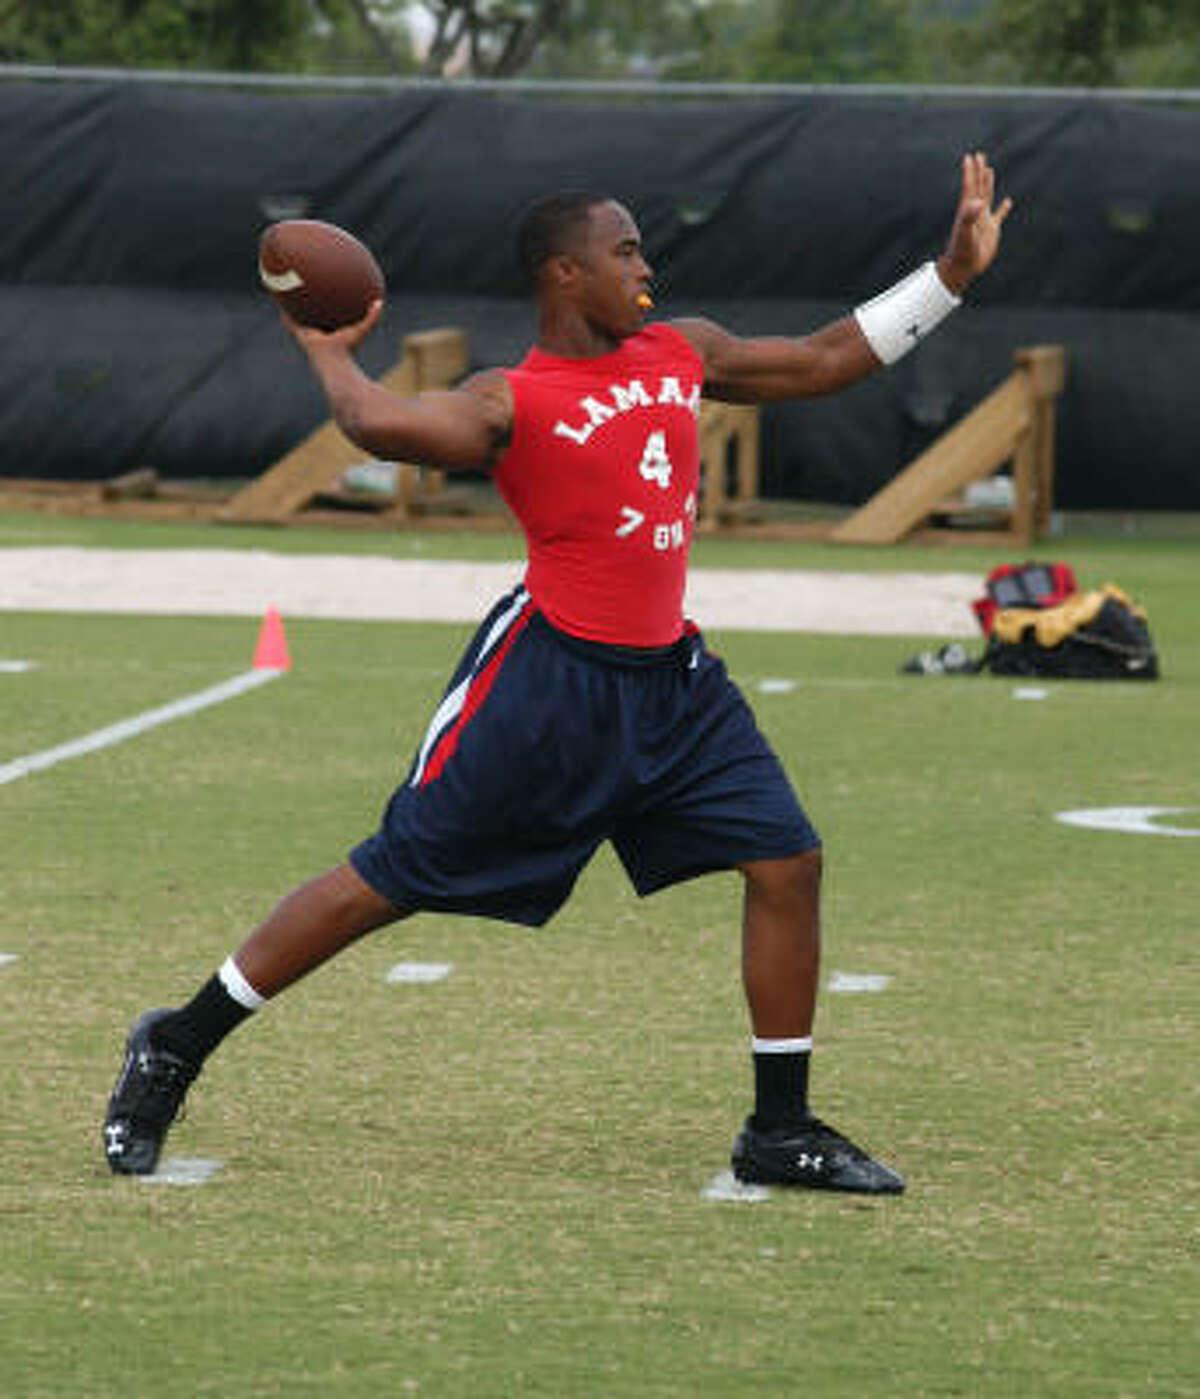 Lamar sophomore quarterback Darren Ervin sets up to pass.